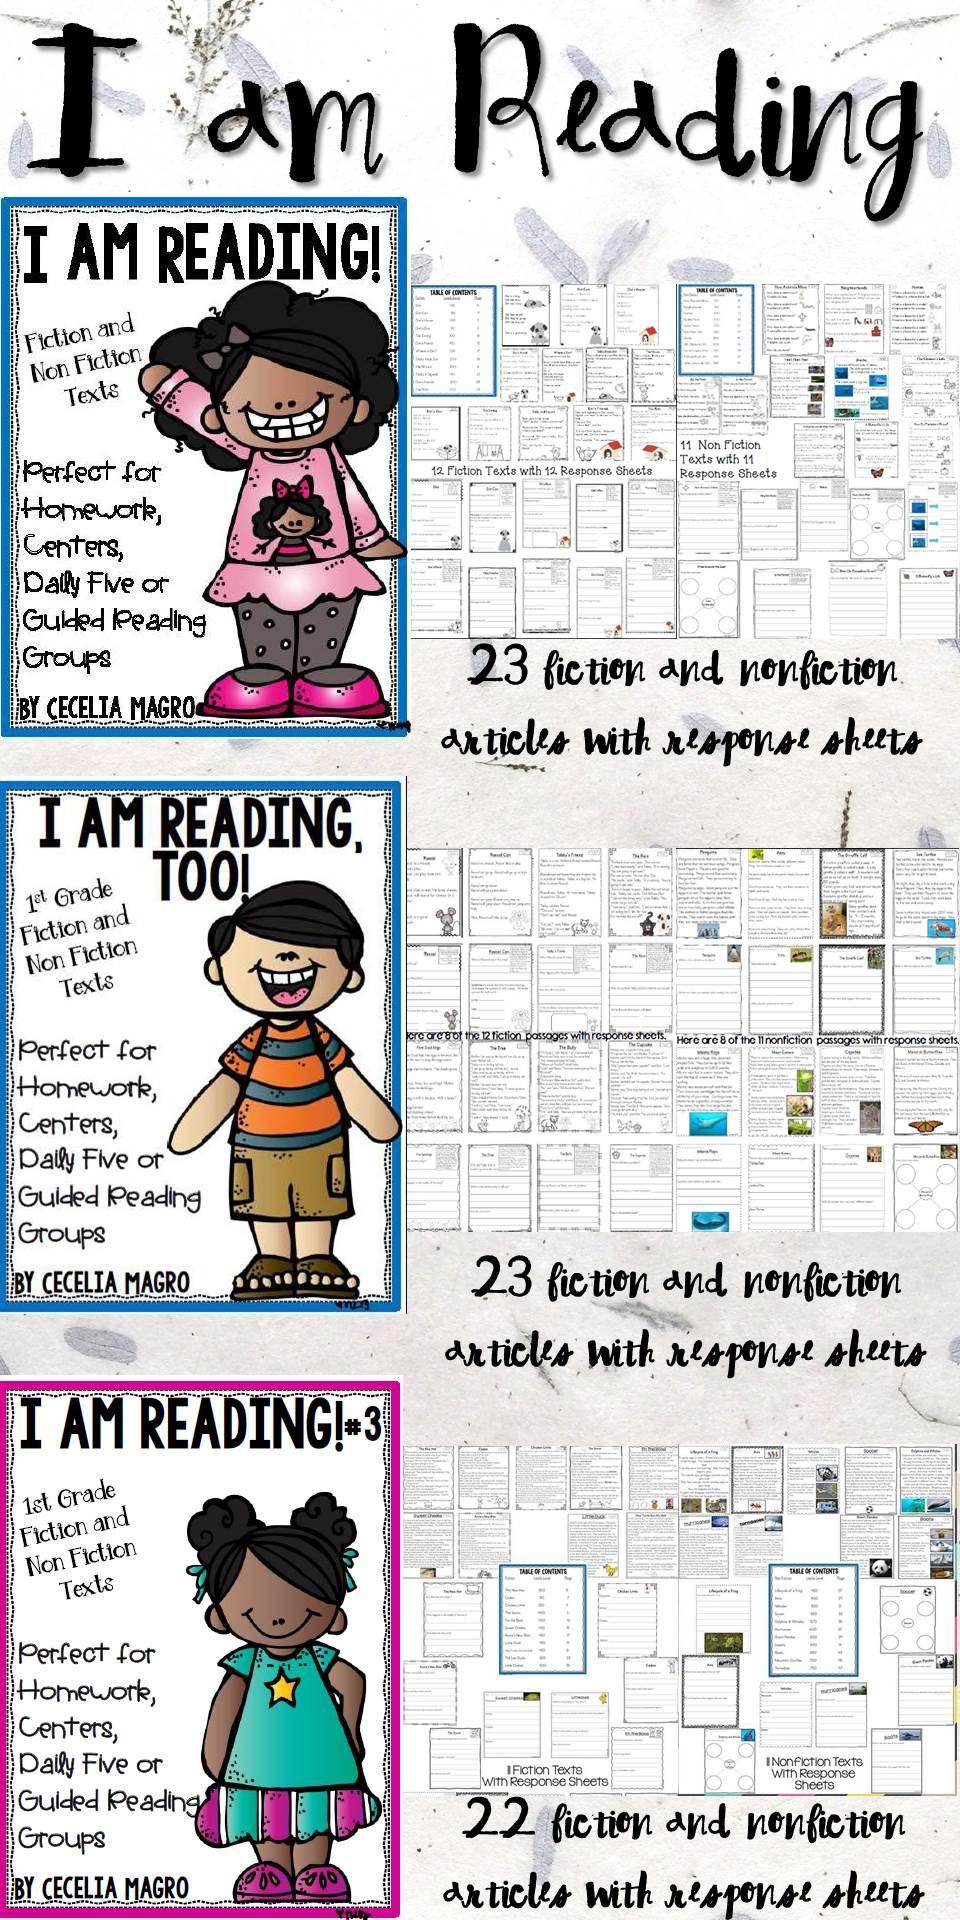 Worksheets For 1st Grade Kids Learning Activity Reading Comprehension Worksheets 1st Grade Reading Worksheets Kindergarten Reading Worksheets [ 1200 x 960 Pixel ]